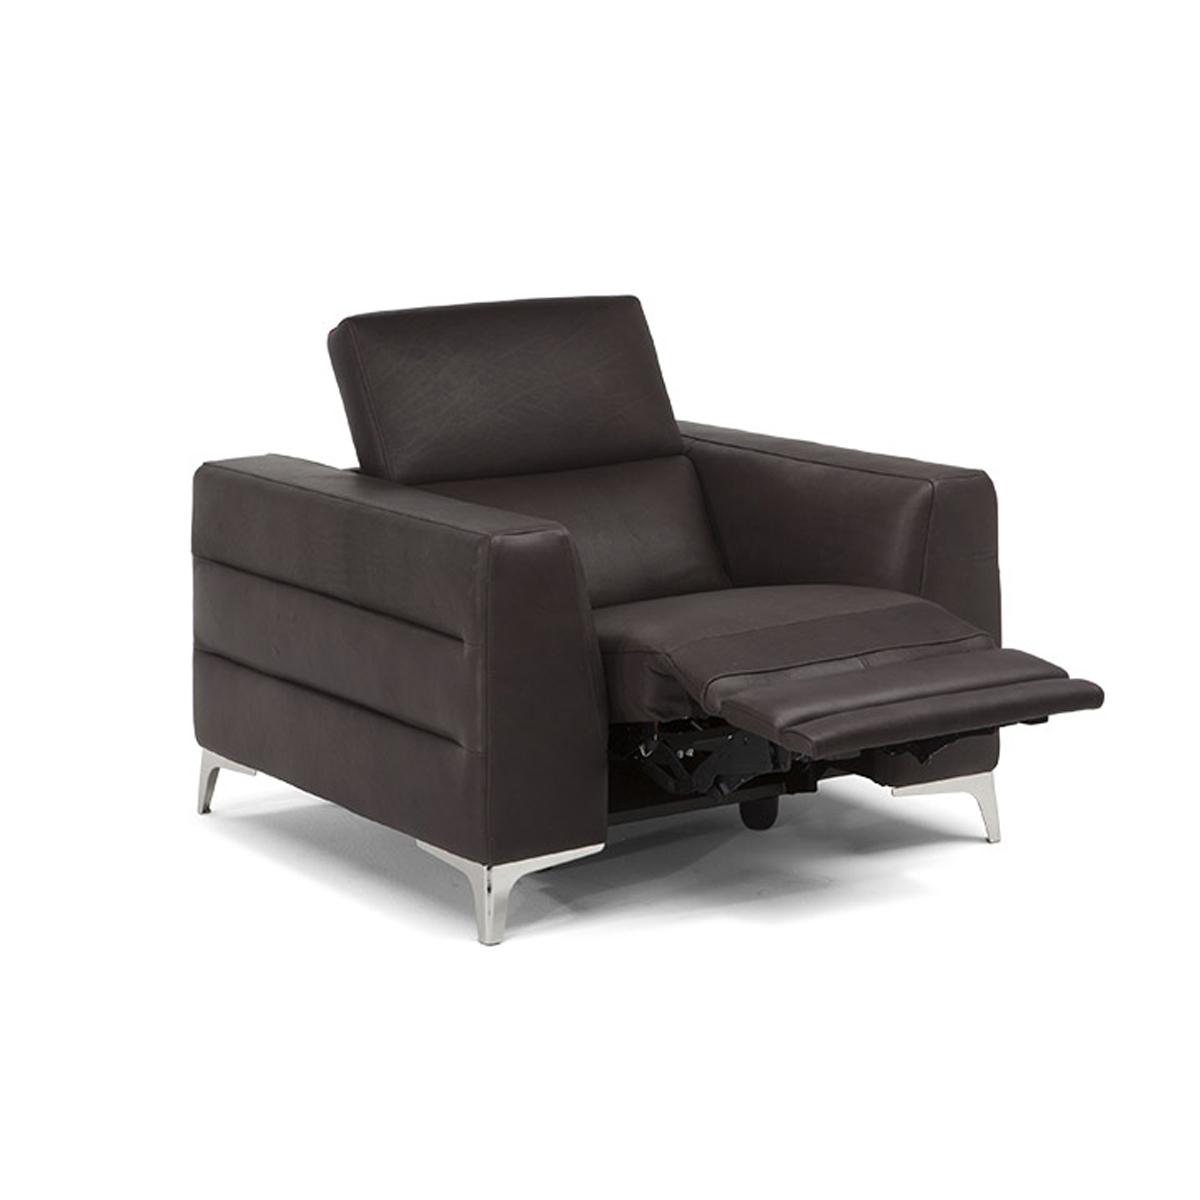 natuzzi electric recliner sofa ferguson copeland surrey editions orgoglio reclining armchair